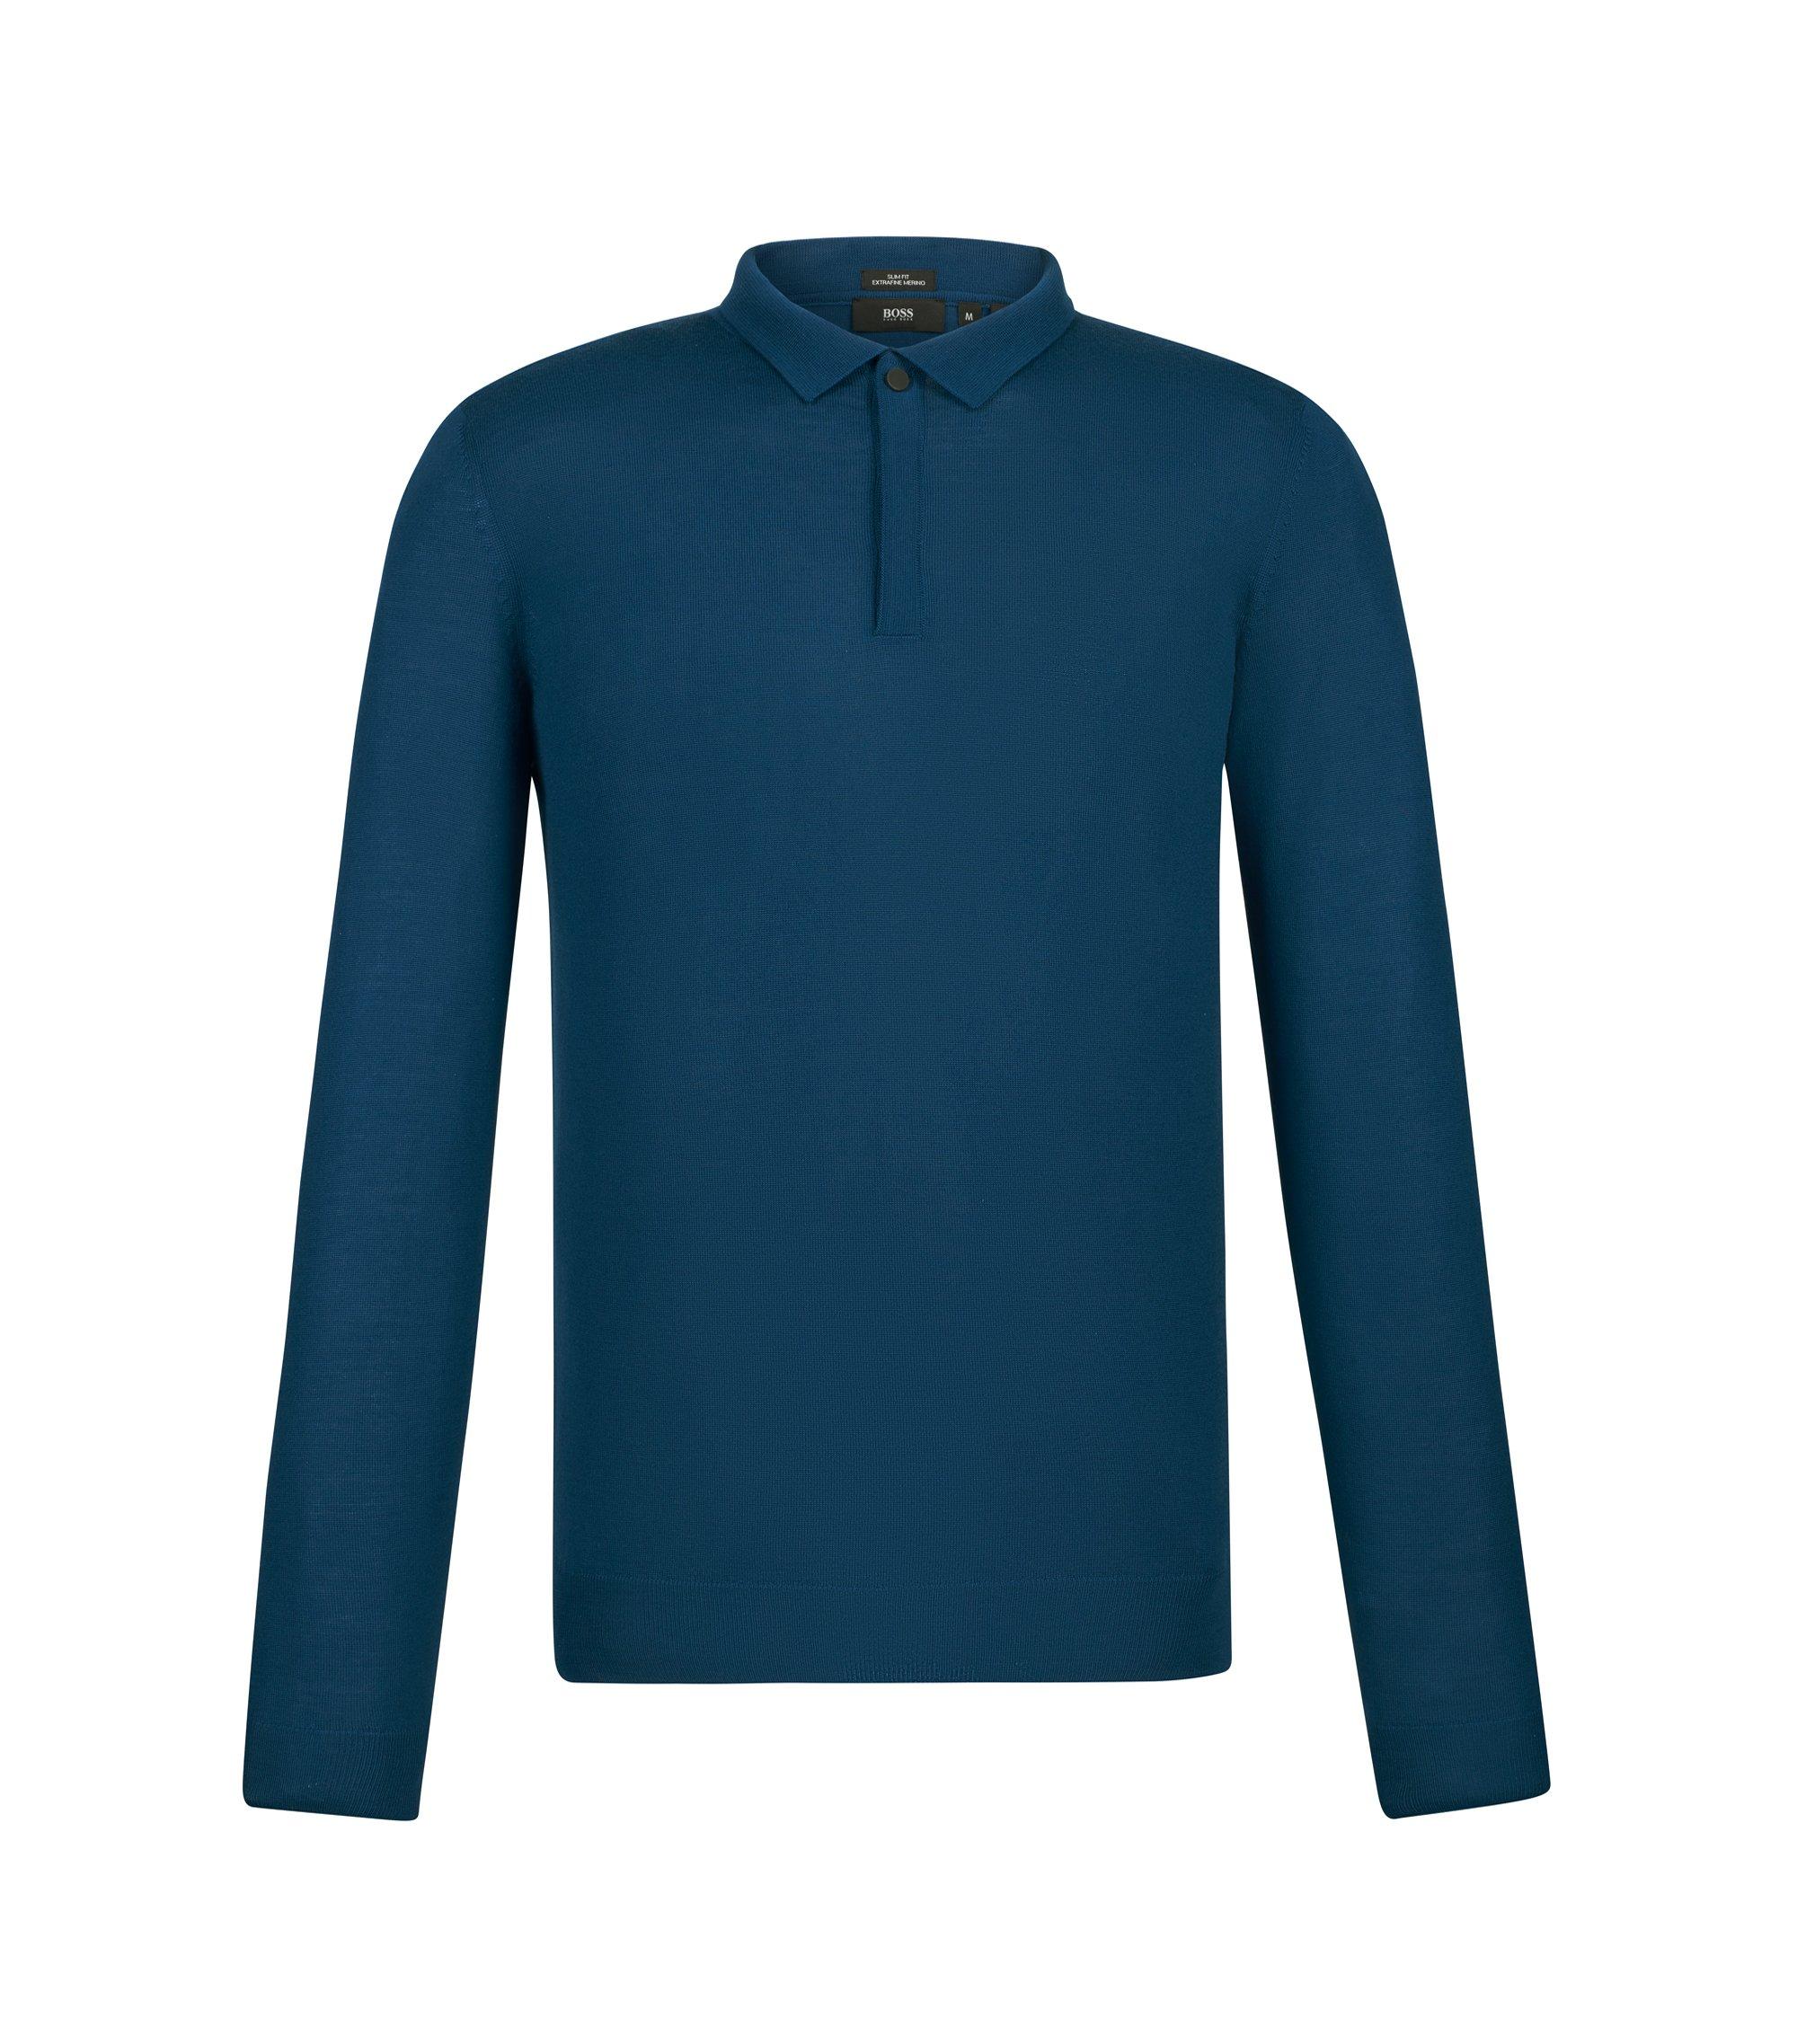 'Iden' | Slim Fit, Merino Virgin Wool Polo Sweater, Turquoise